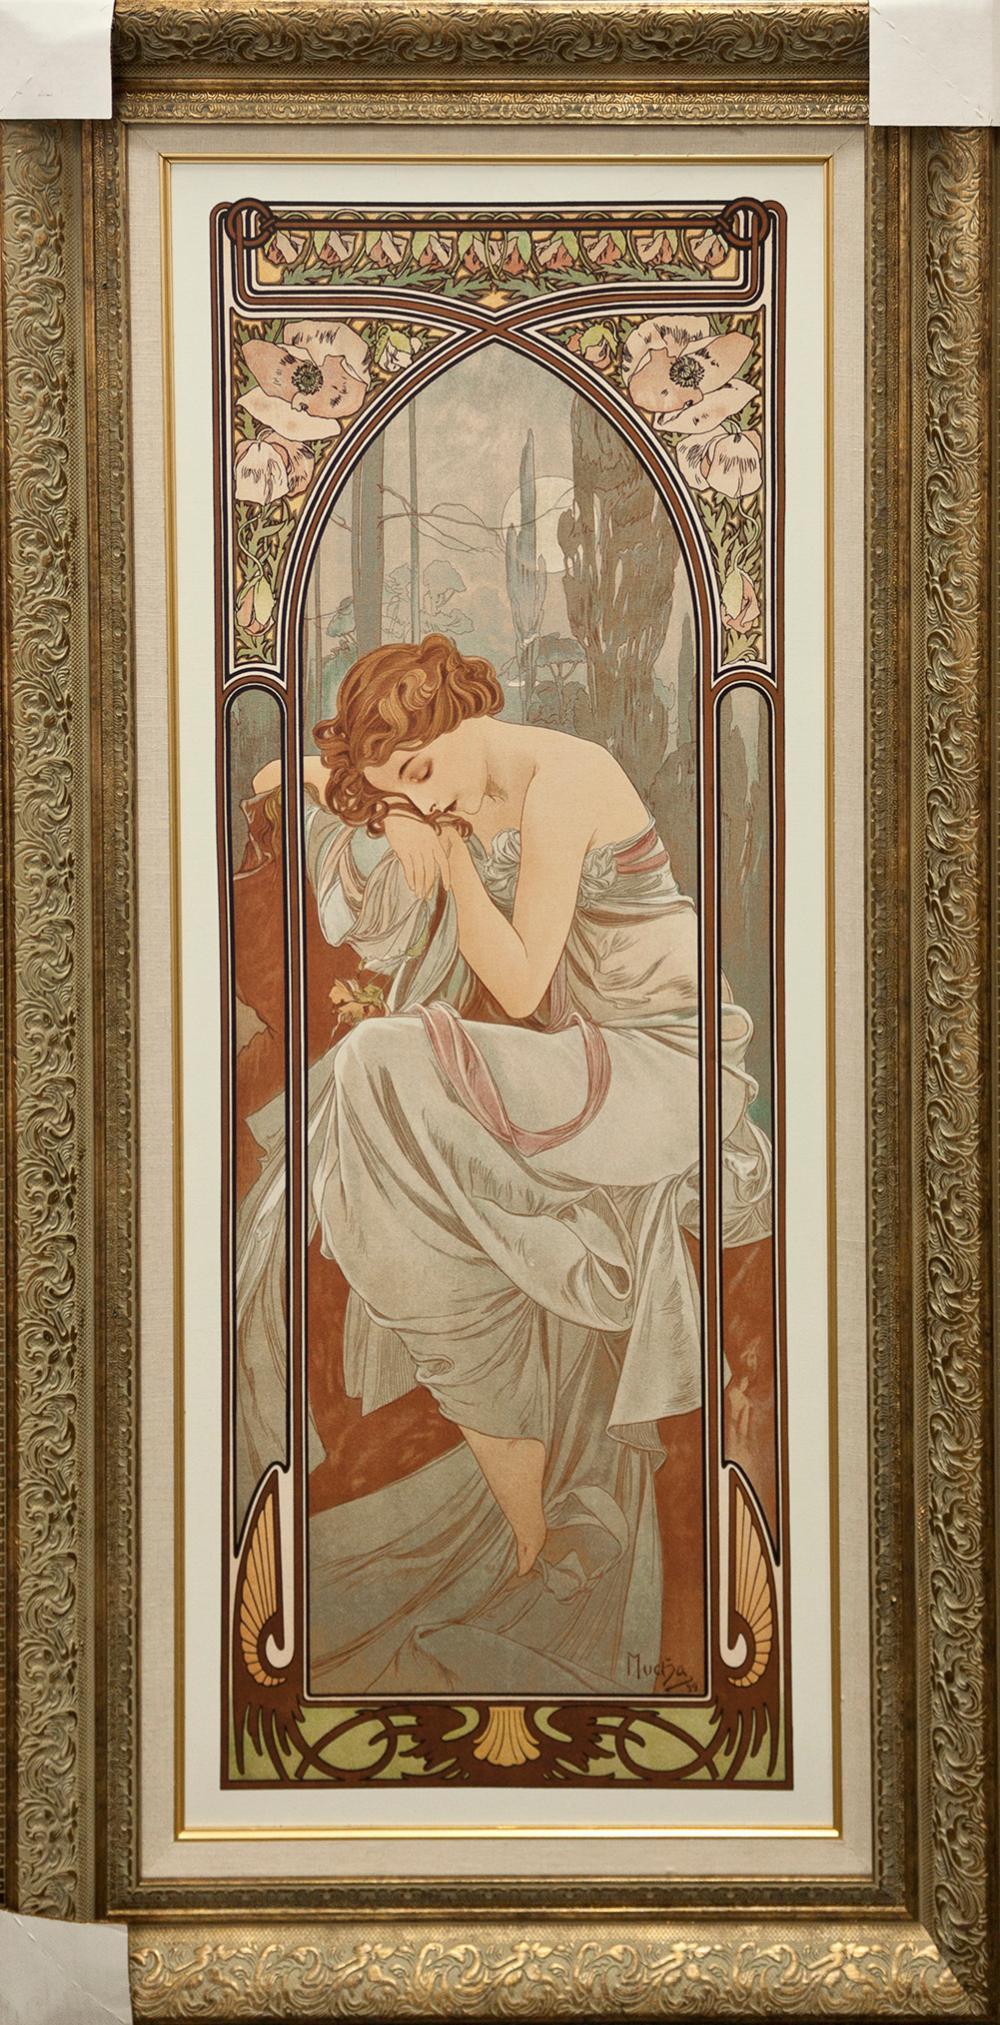 Lot 3427: Awakening Custom Framed Alphonse Mucha Giclee on Canvas